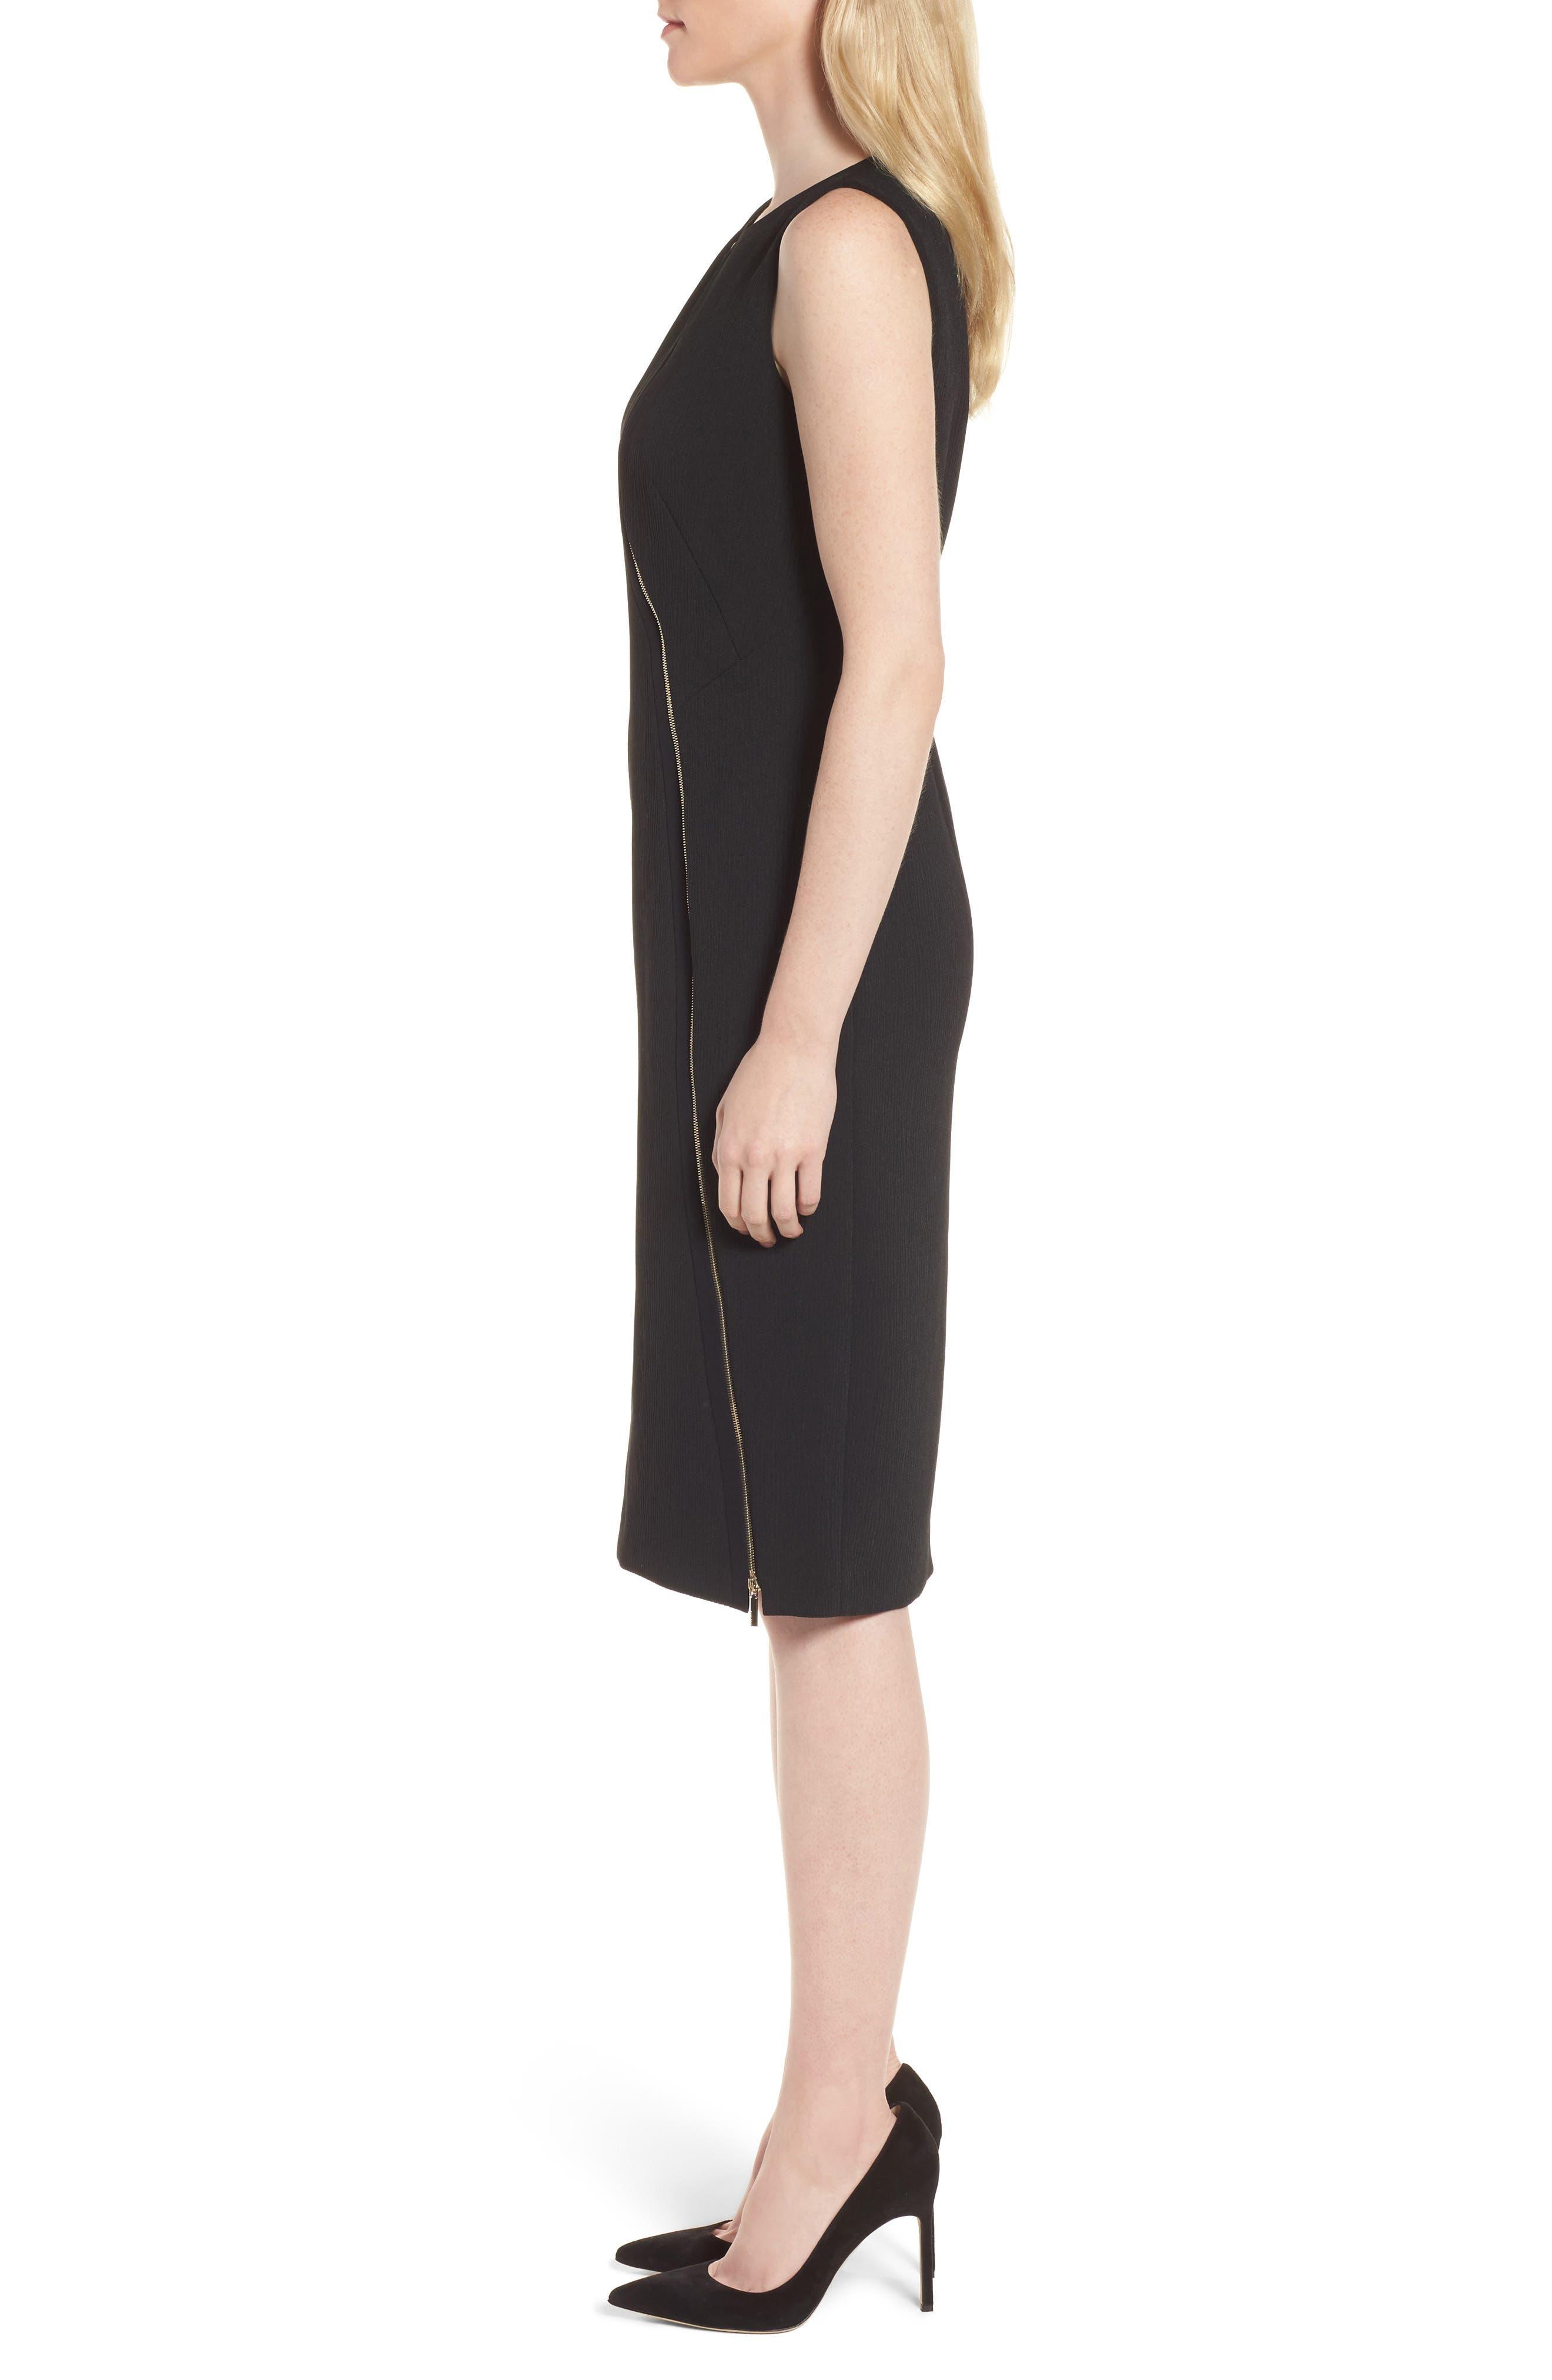 Danafea Dress,                             Alternate thumbnail 3, color,                             001